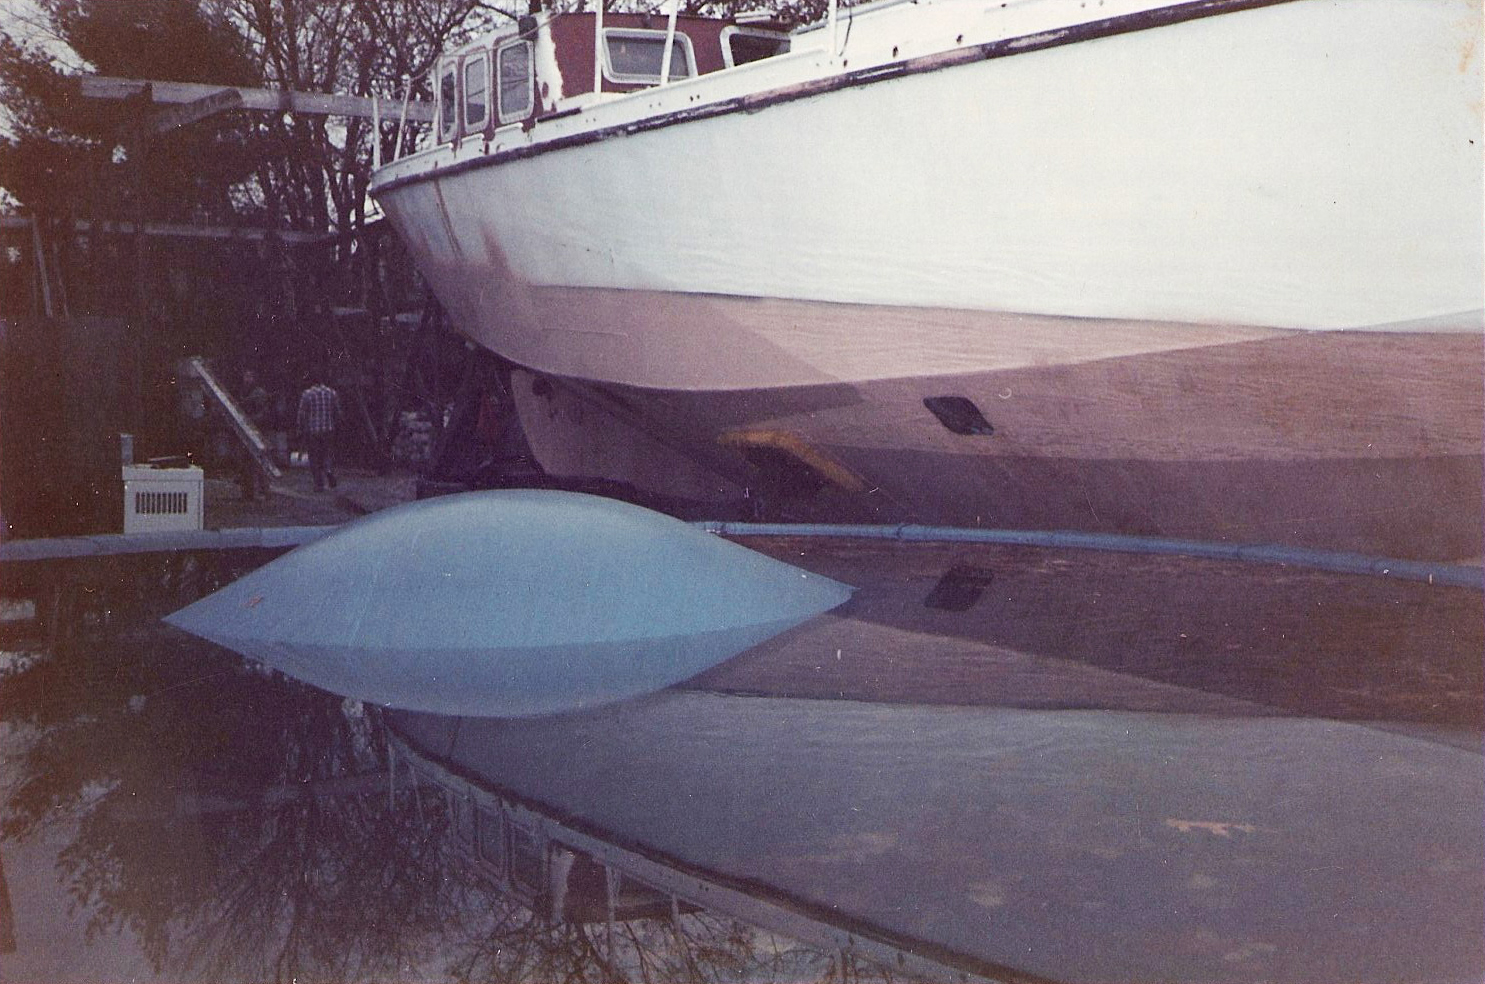 starboard_2.jpg